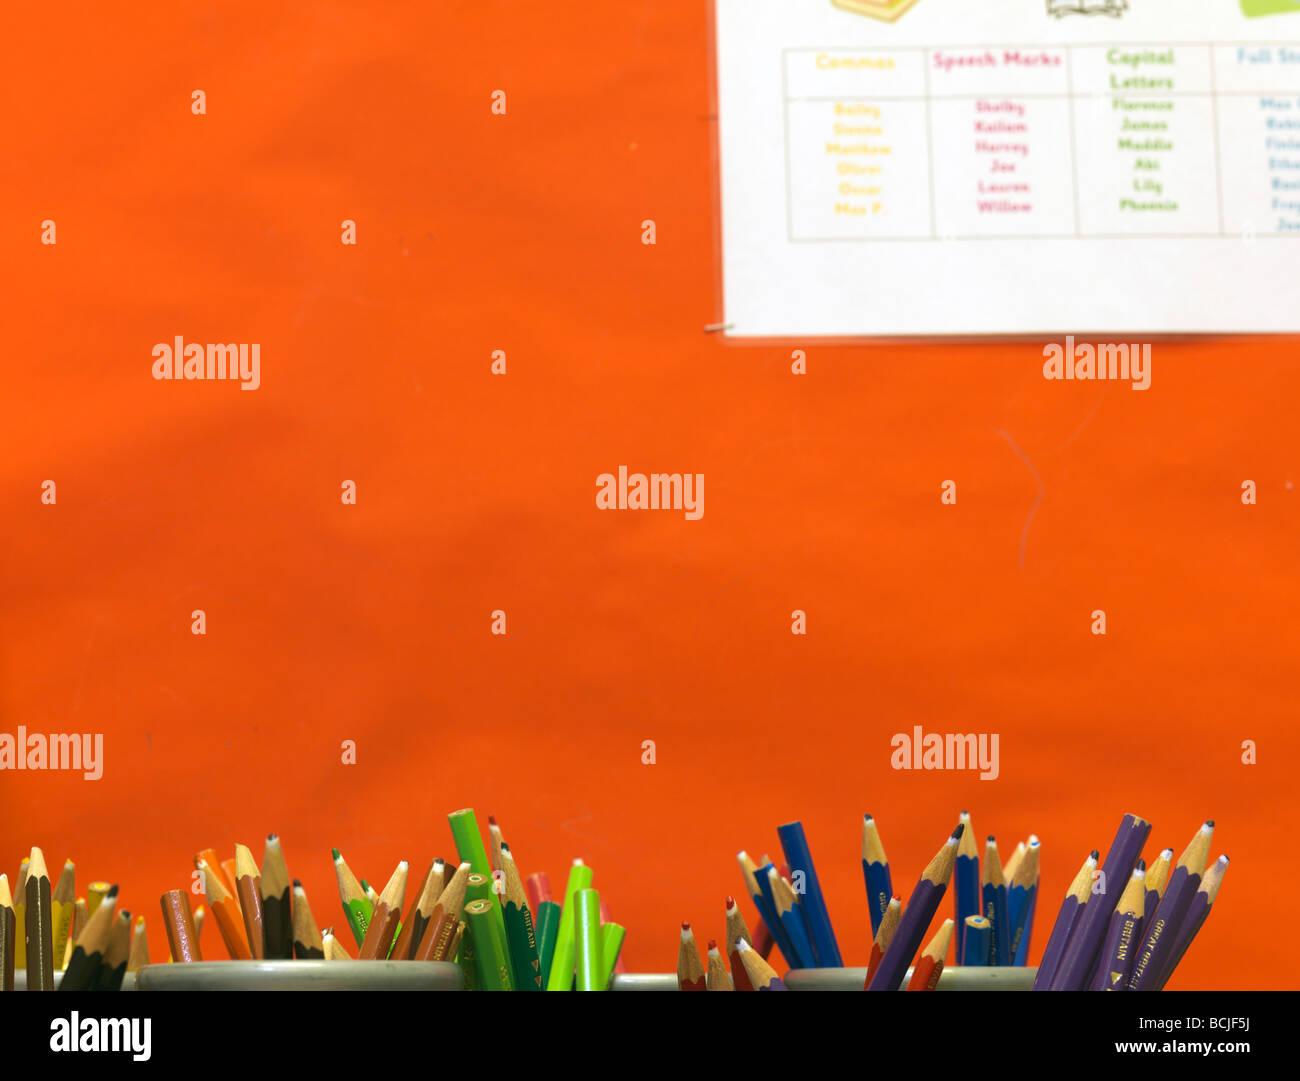 Buntstifte in Schule Töpfe Stockbild